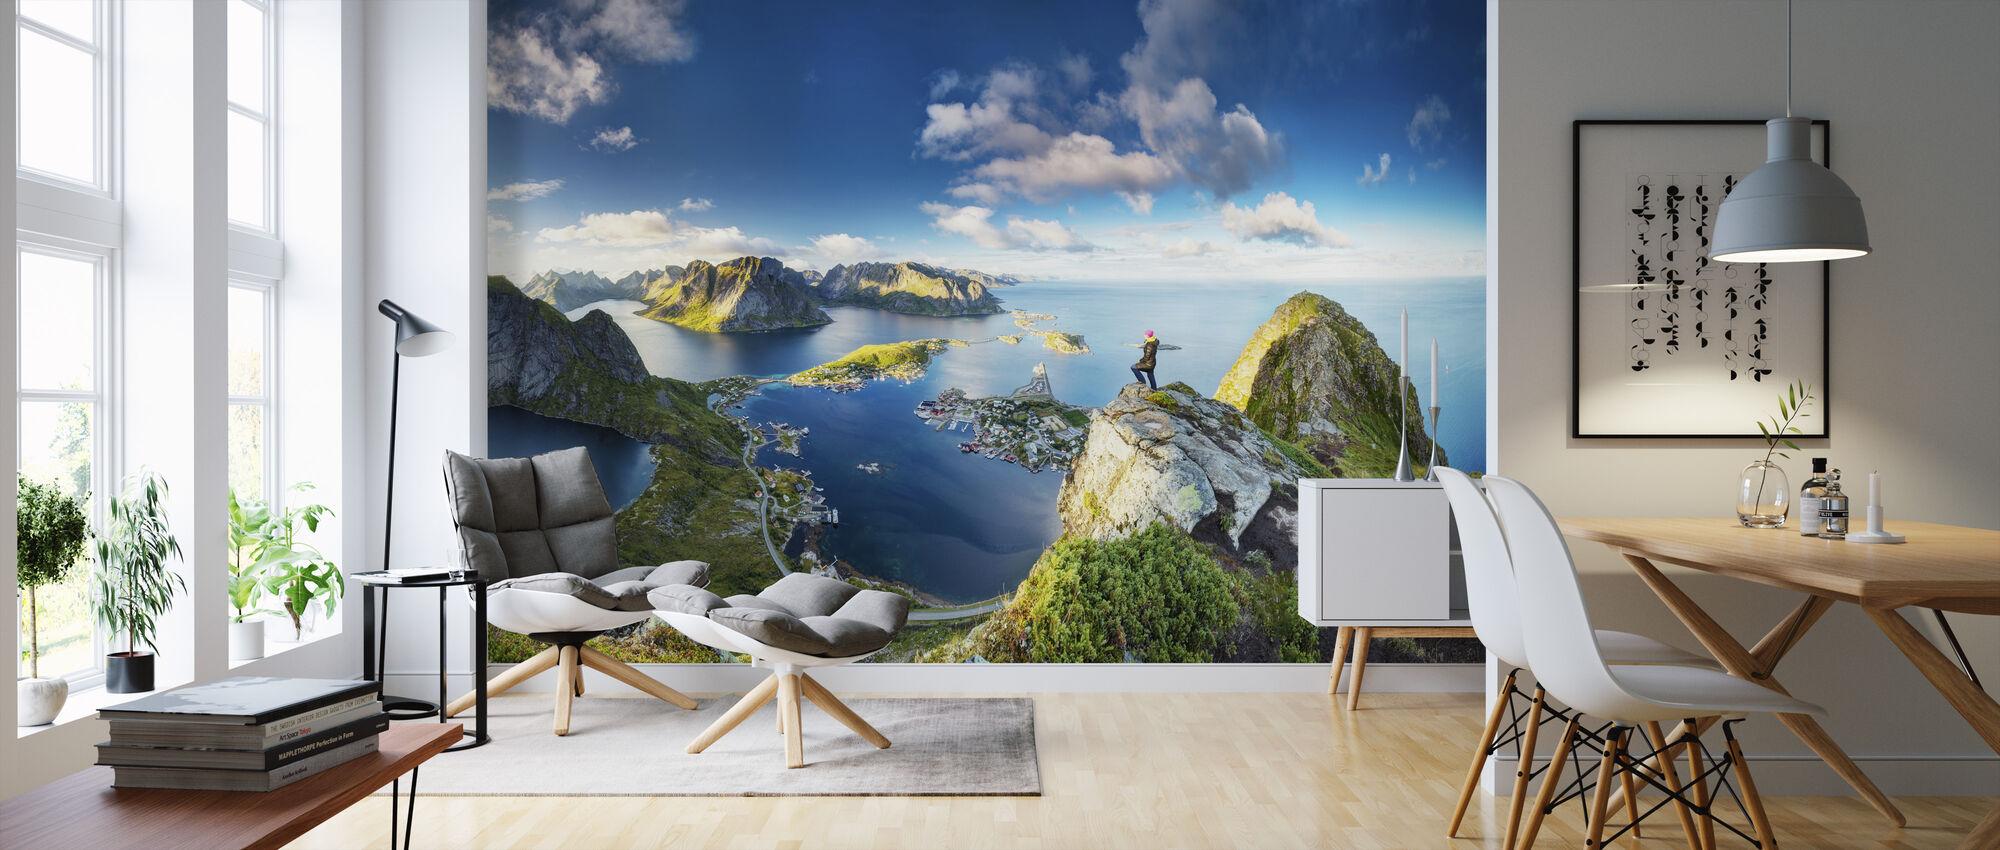 Bringing Views - Wallpaper - Living Room